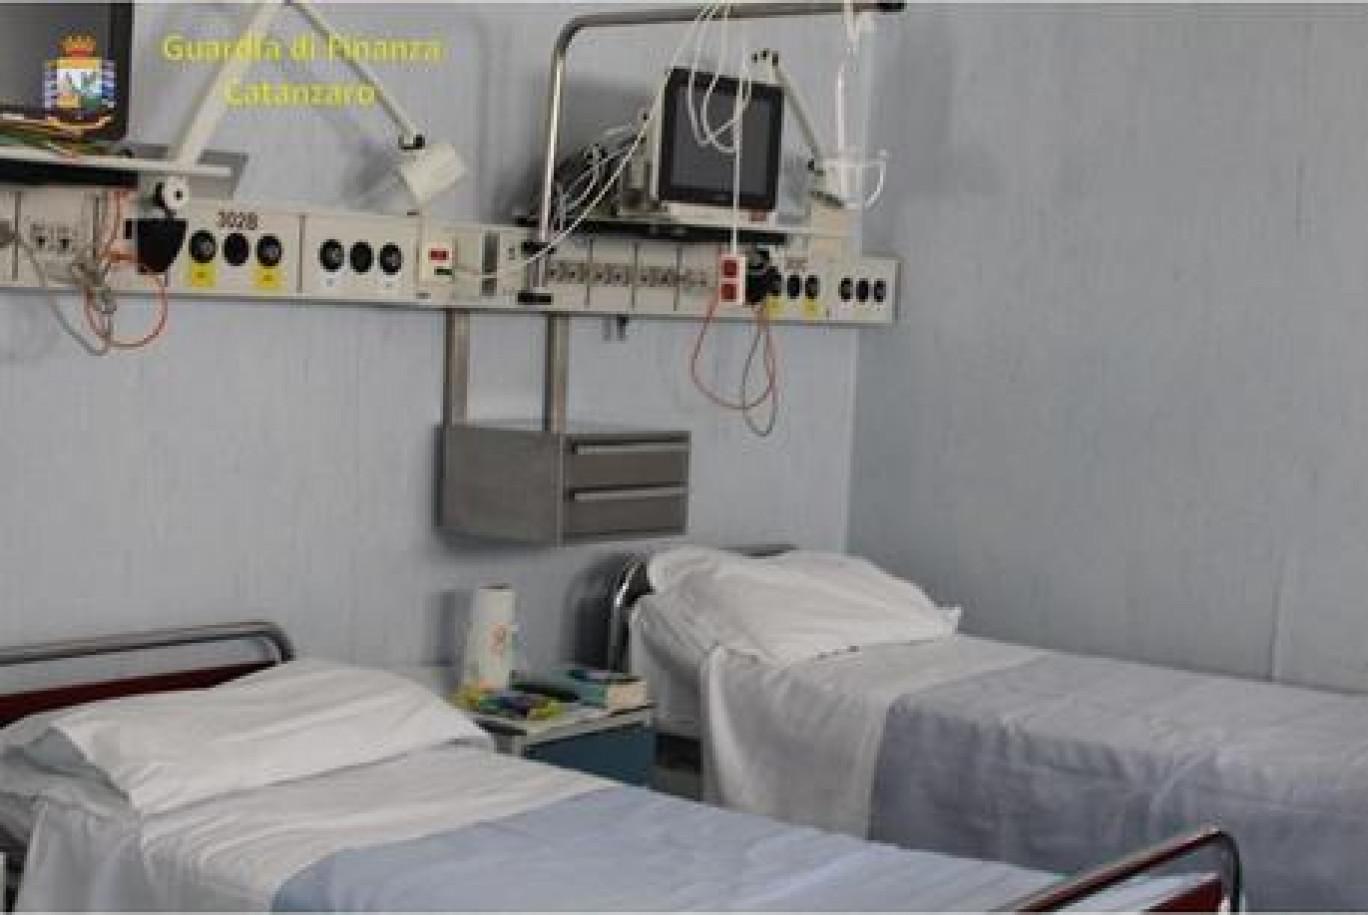 Falsi ricoveri terapia intensiva,scoperta truffa da 10,5 mln